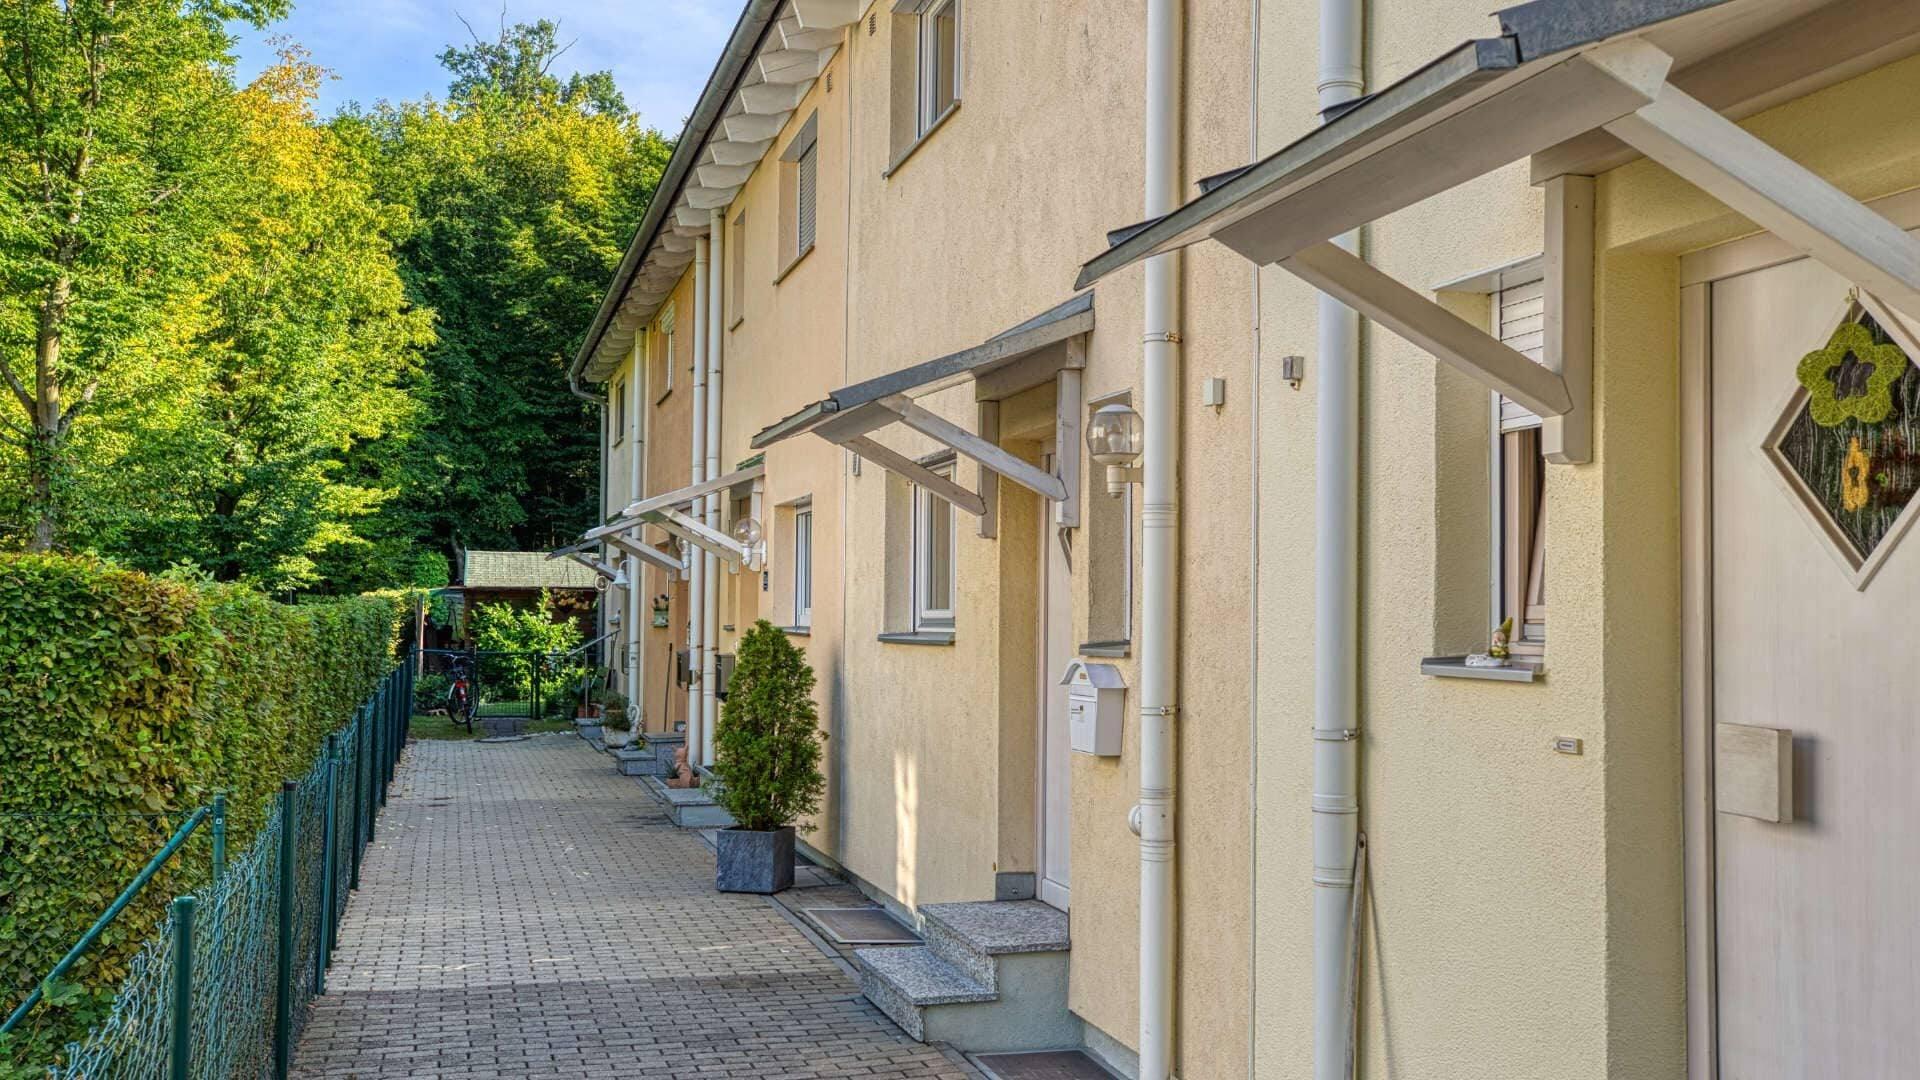 Germering Haus Zugang